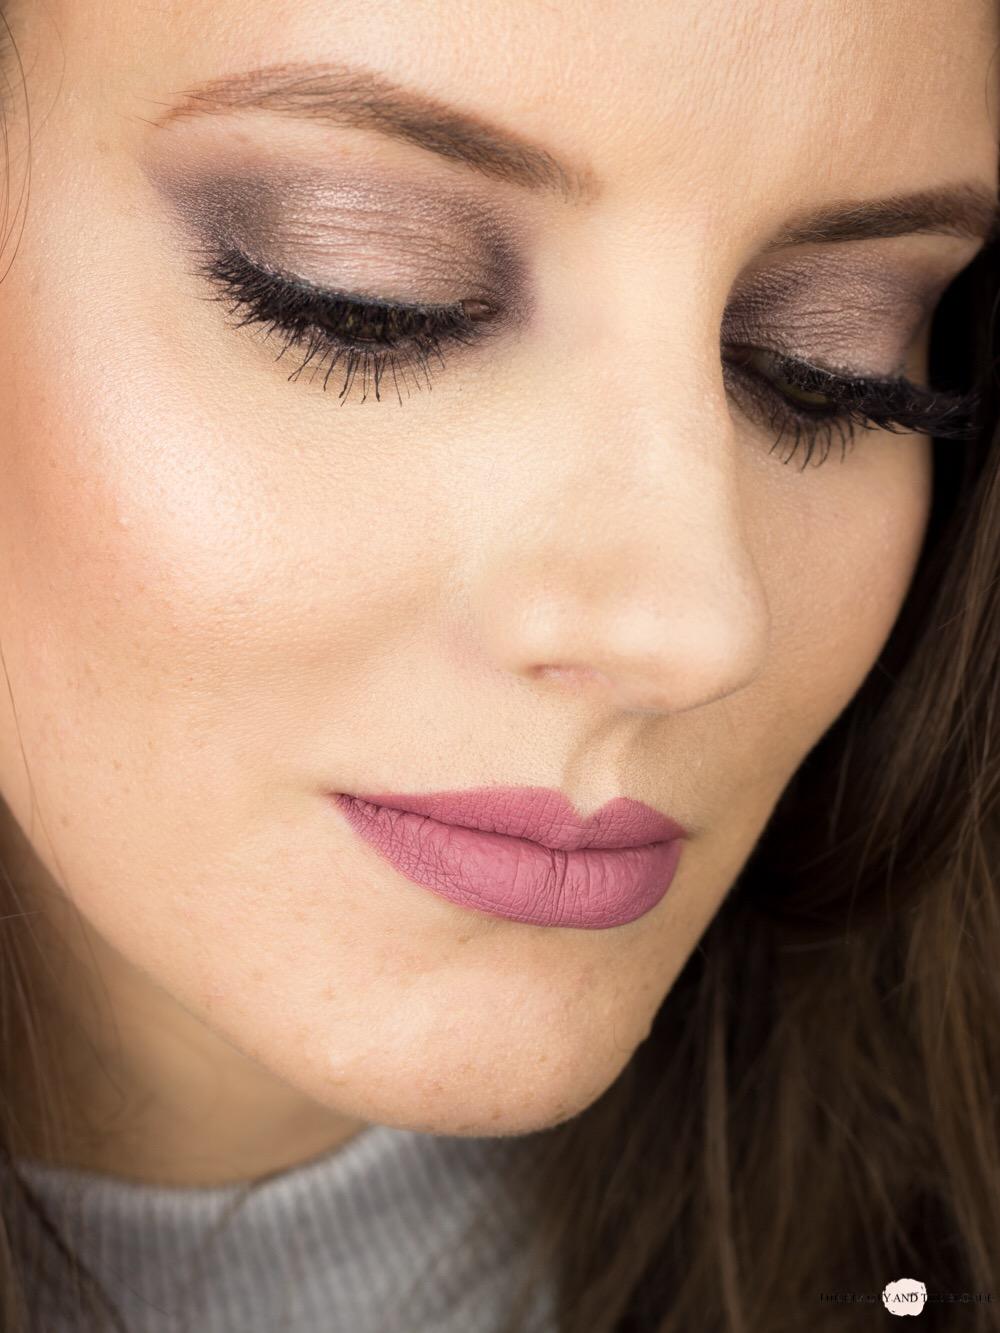 Lorac Pro 1 Palette Pewter Look AMU Makeup Beautyblog German Eyemakeup Eine Palette vier Looks